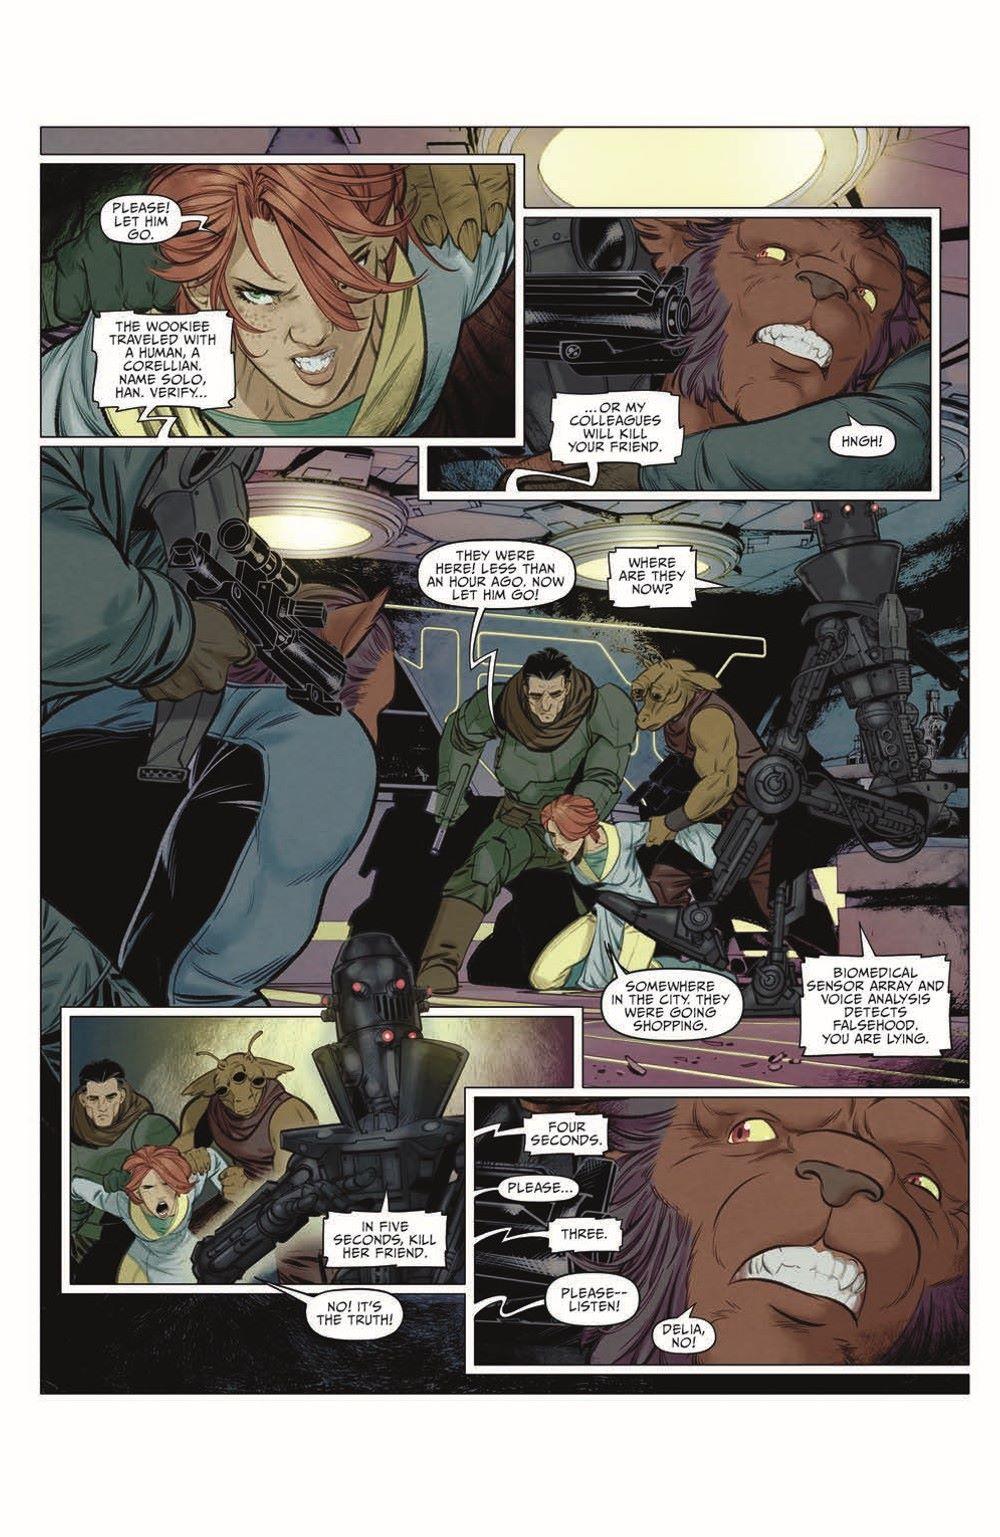 SWA_Smuggler02_pr-3 ComicList Previews: STAR WARS ADVENTURES SMUGGLER'S RUN #2 (OF 2)